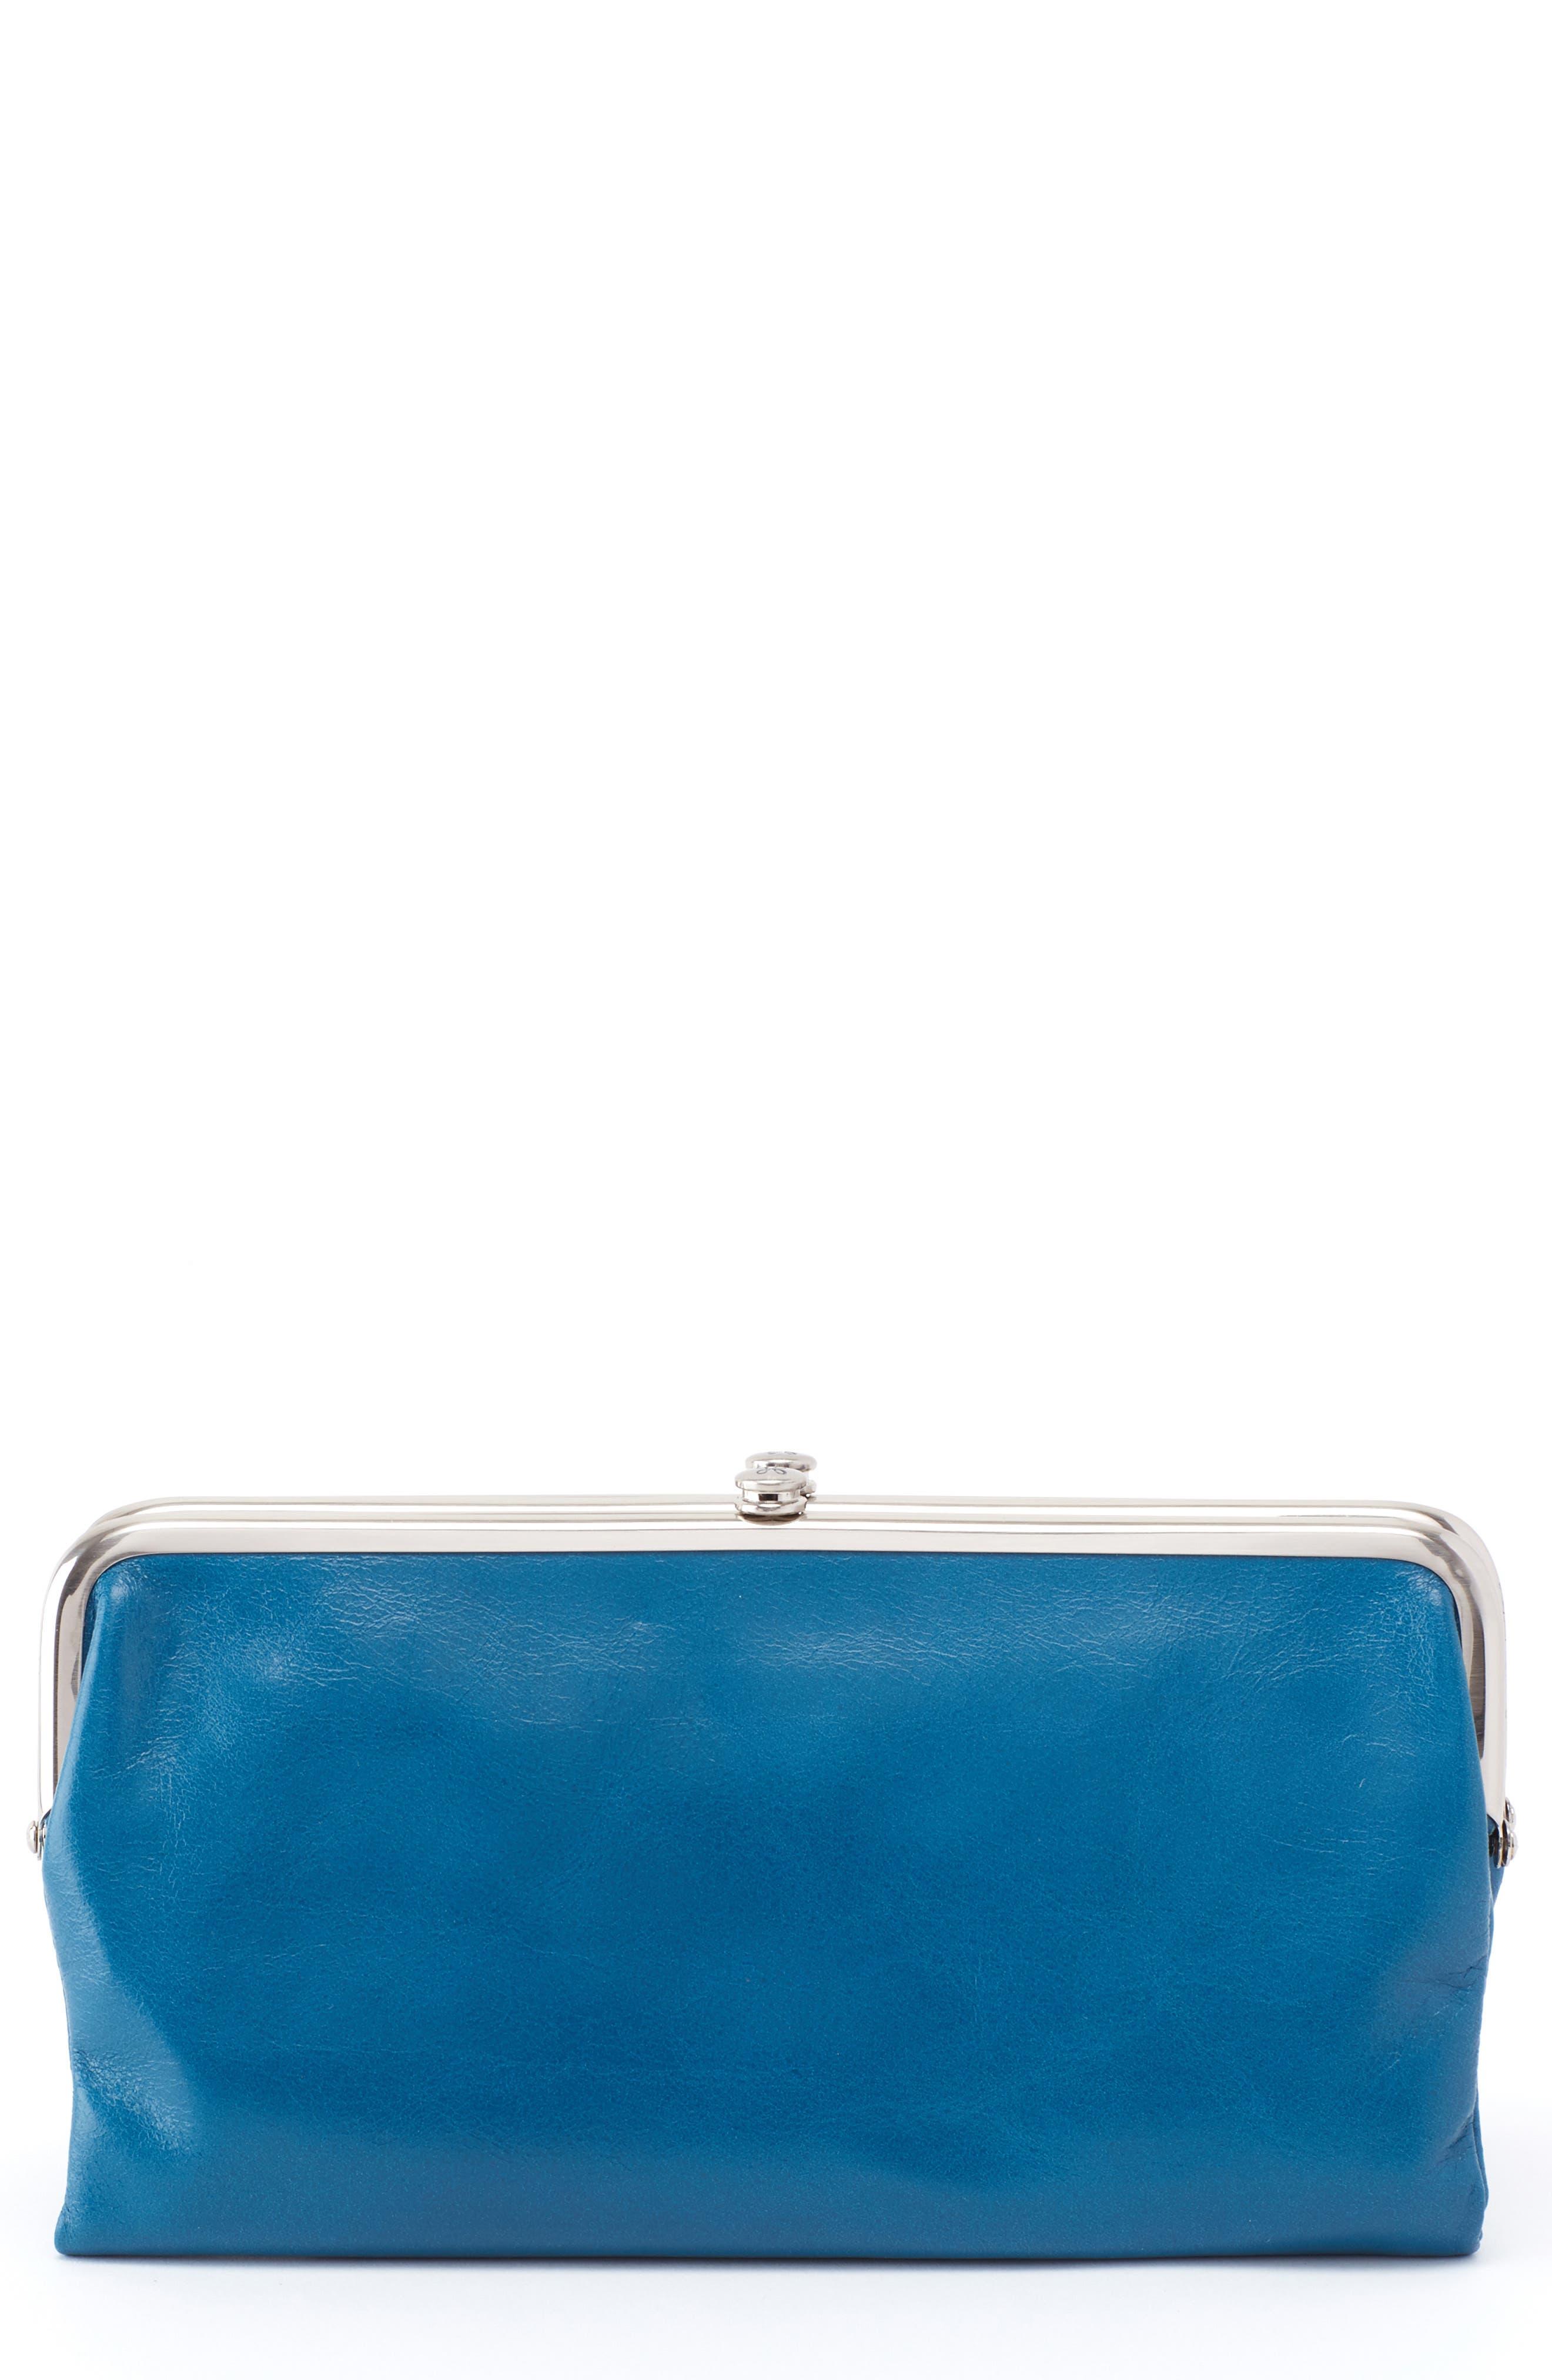 Handbags   Wallets for Women  3f177cd0f2a8d